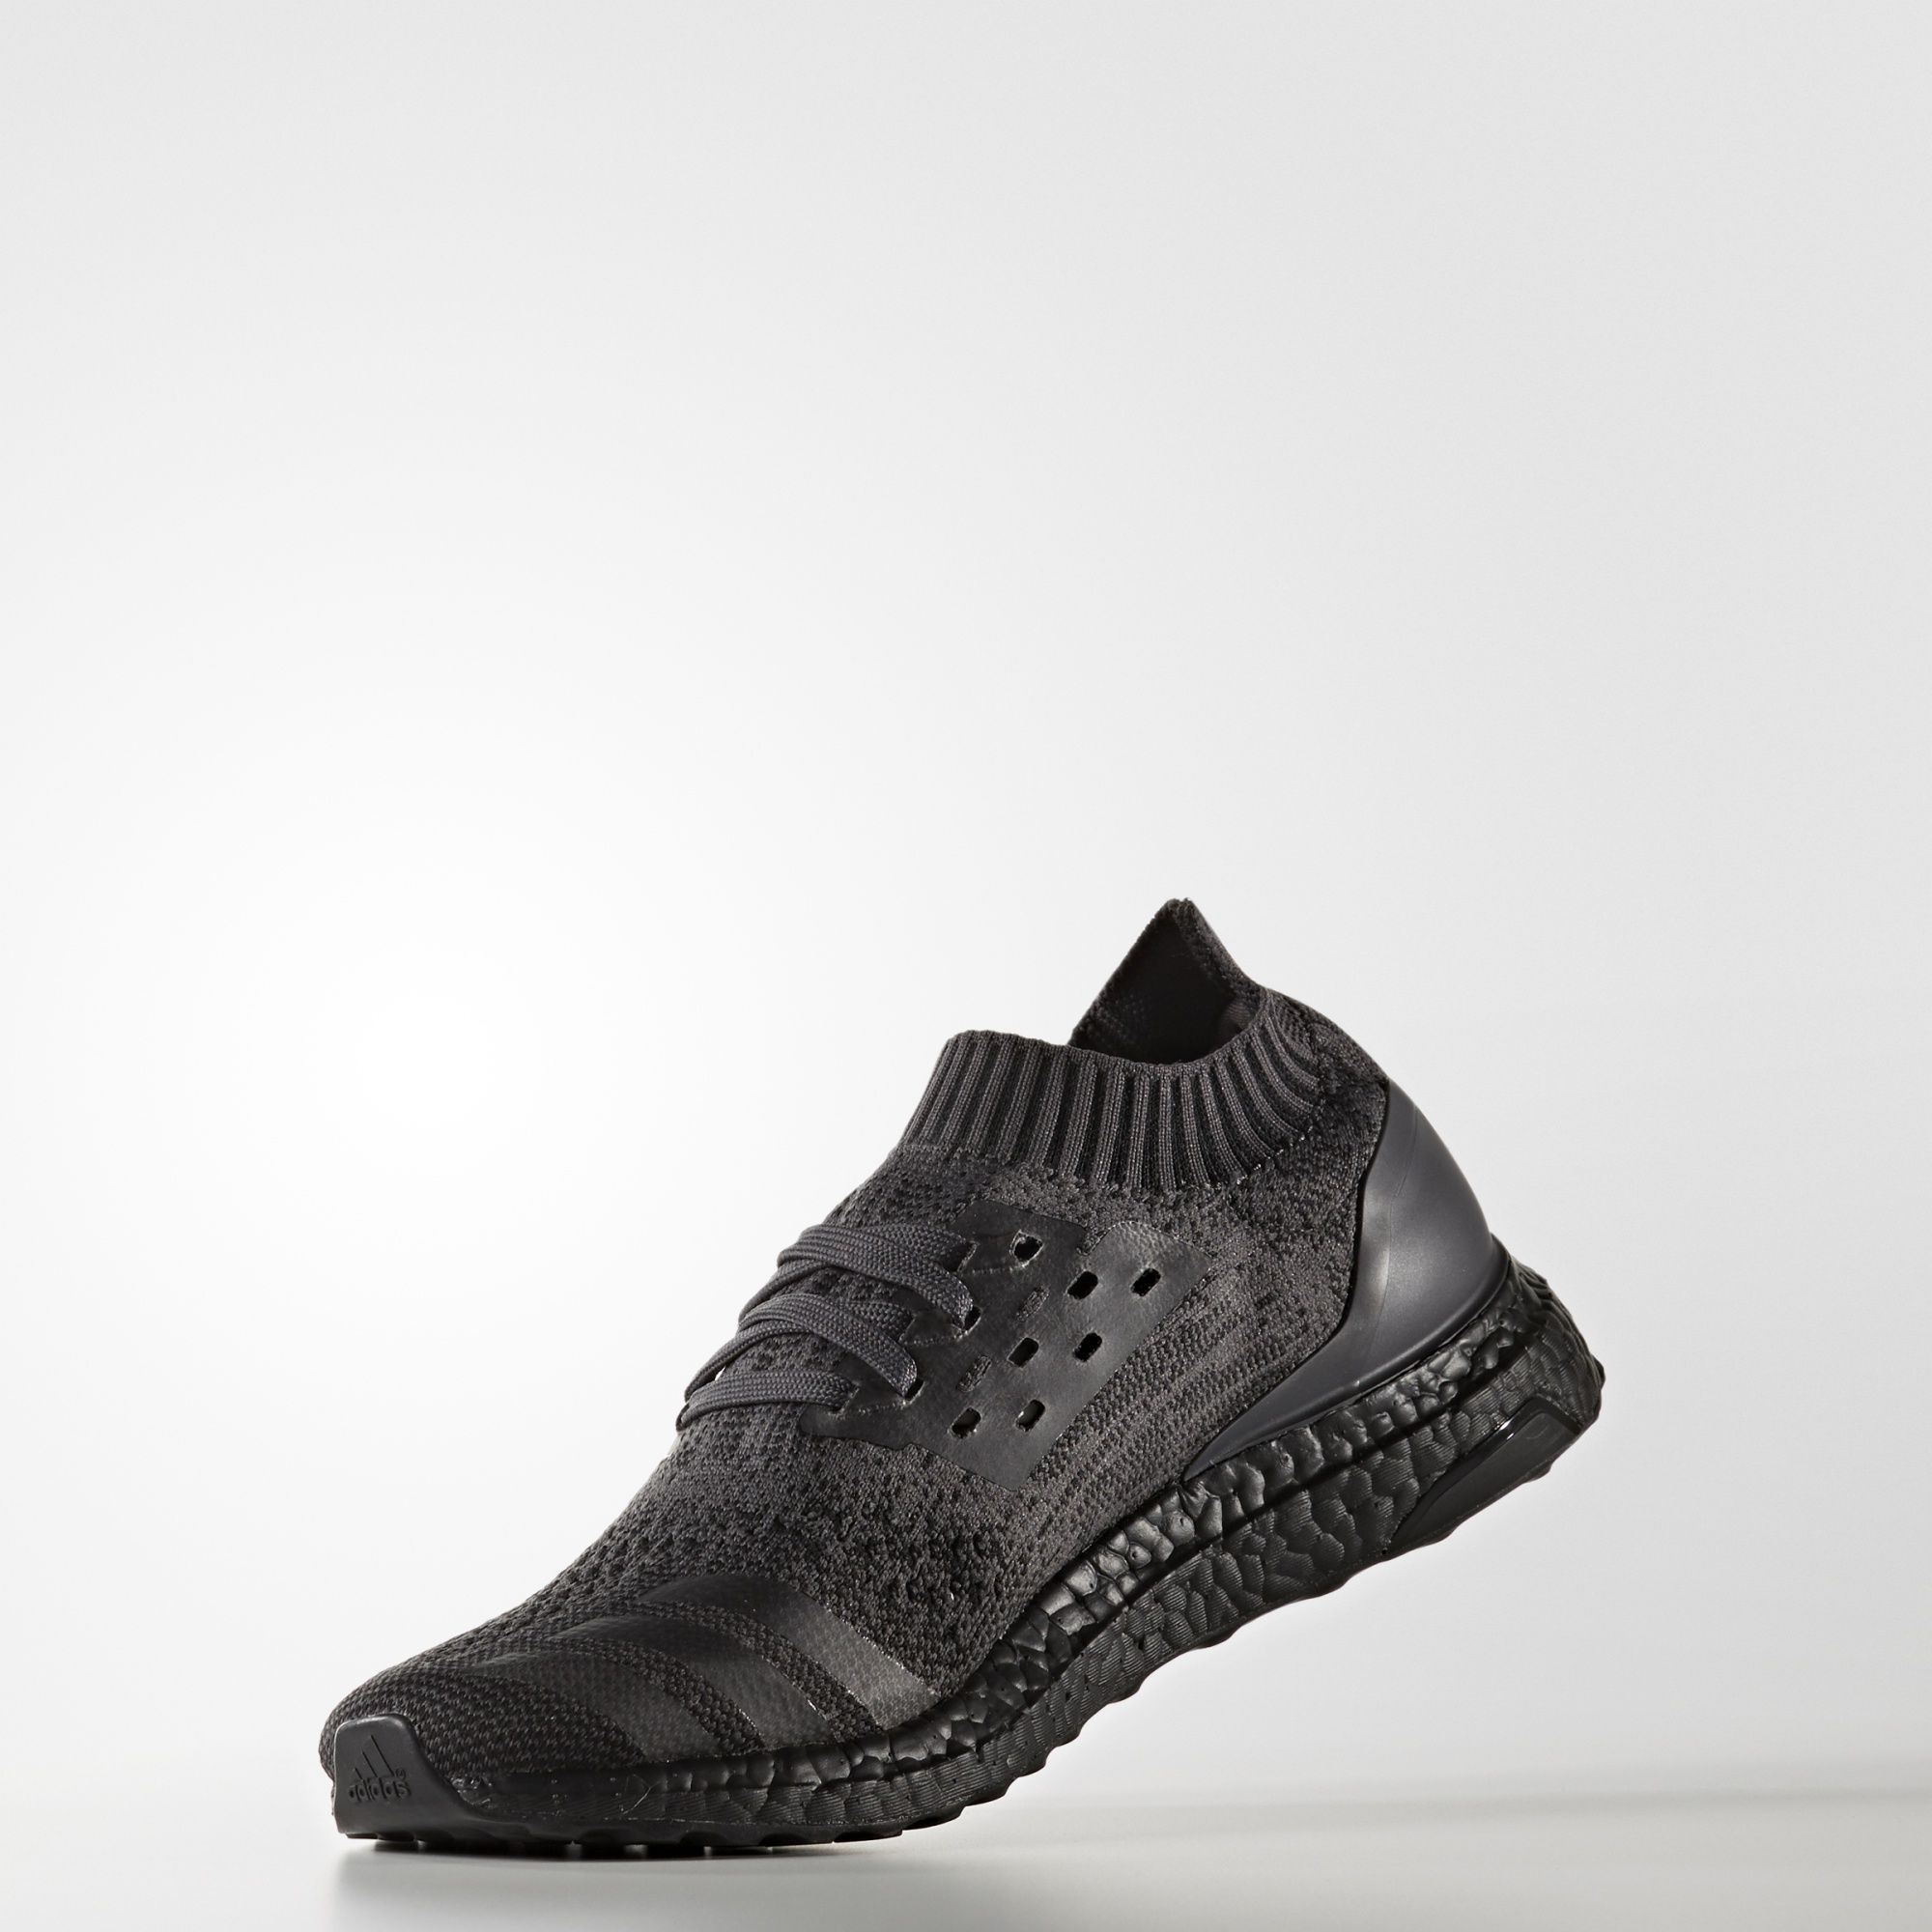 f616fe34 new zealand adidas ultra boost uncaged sko 218a0 cfd87